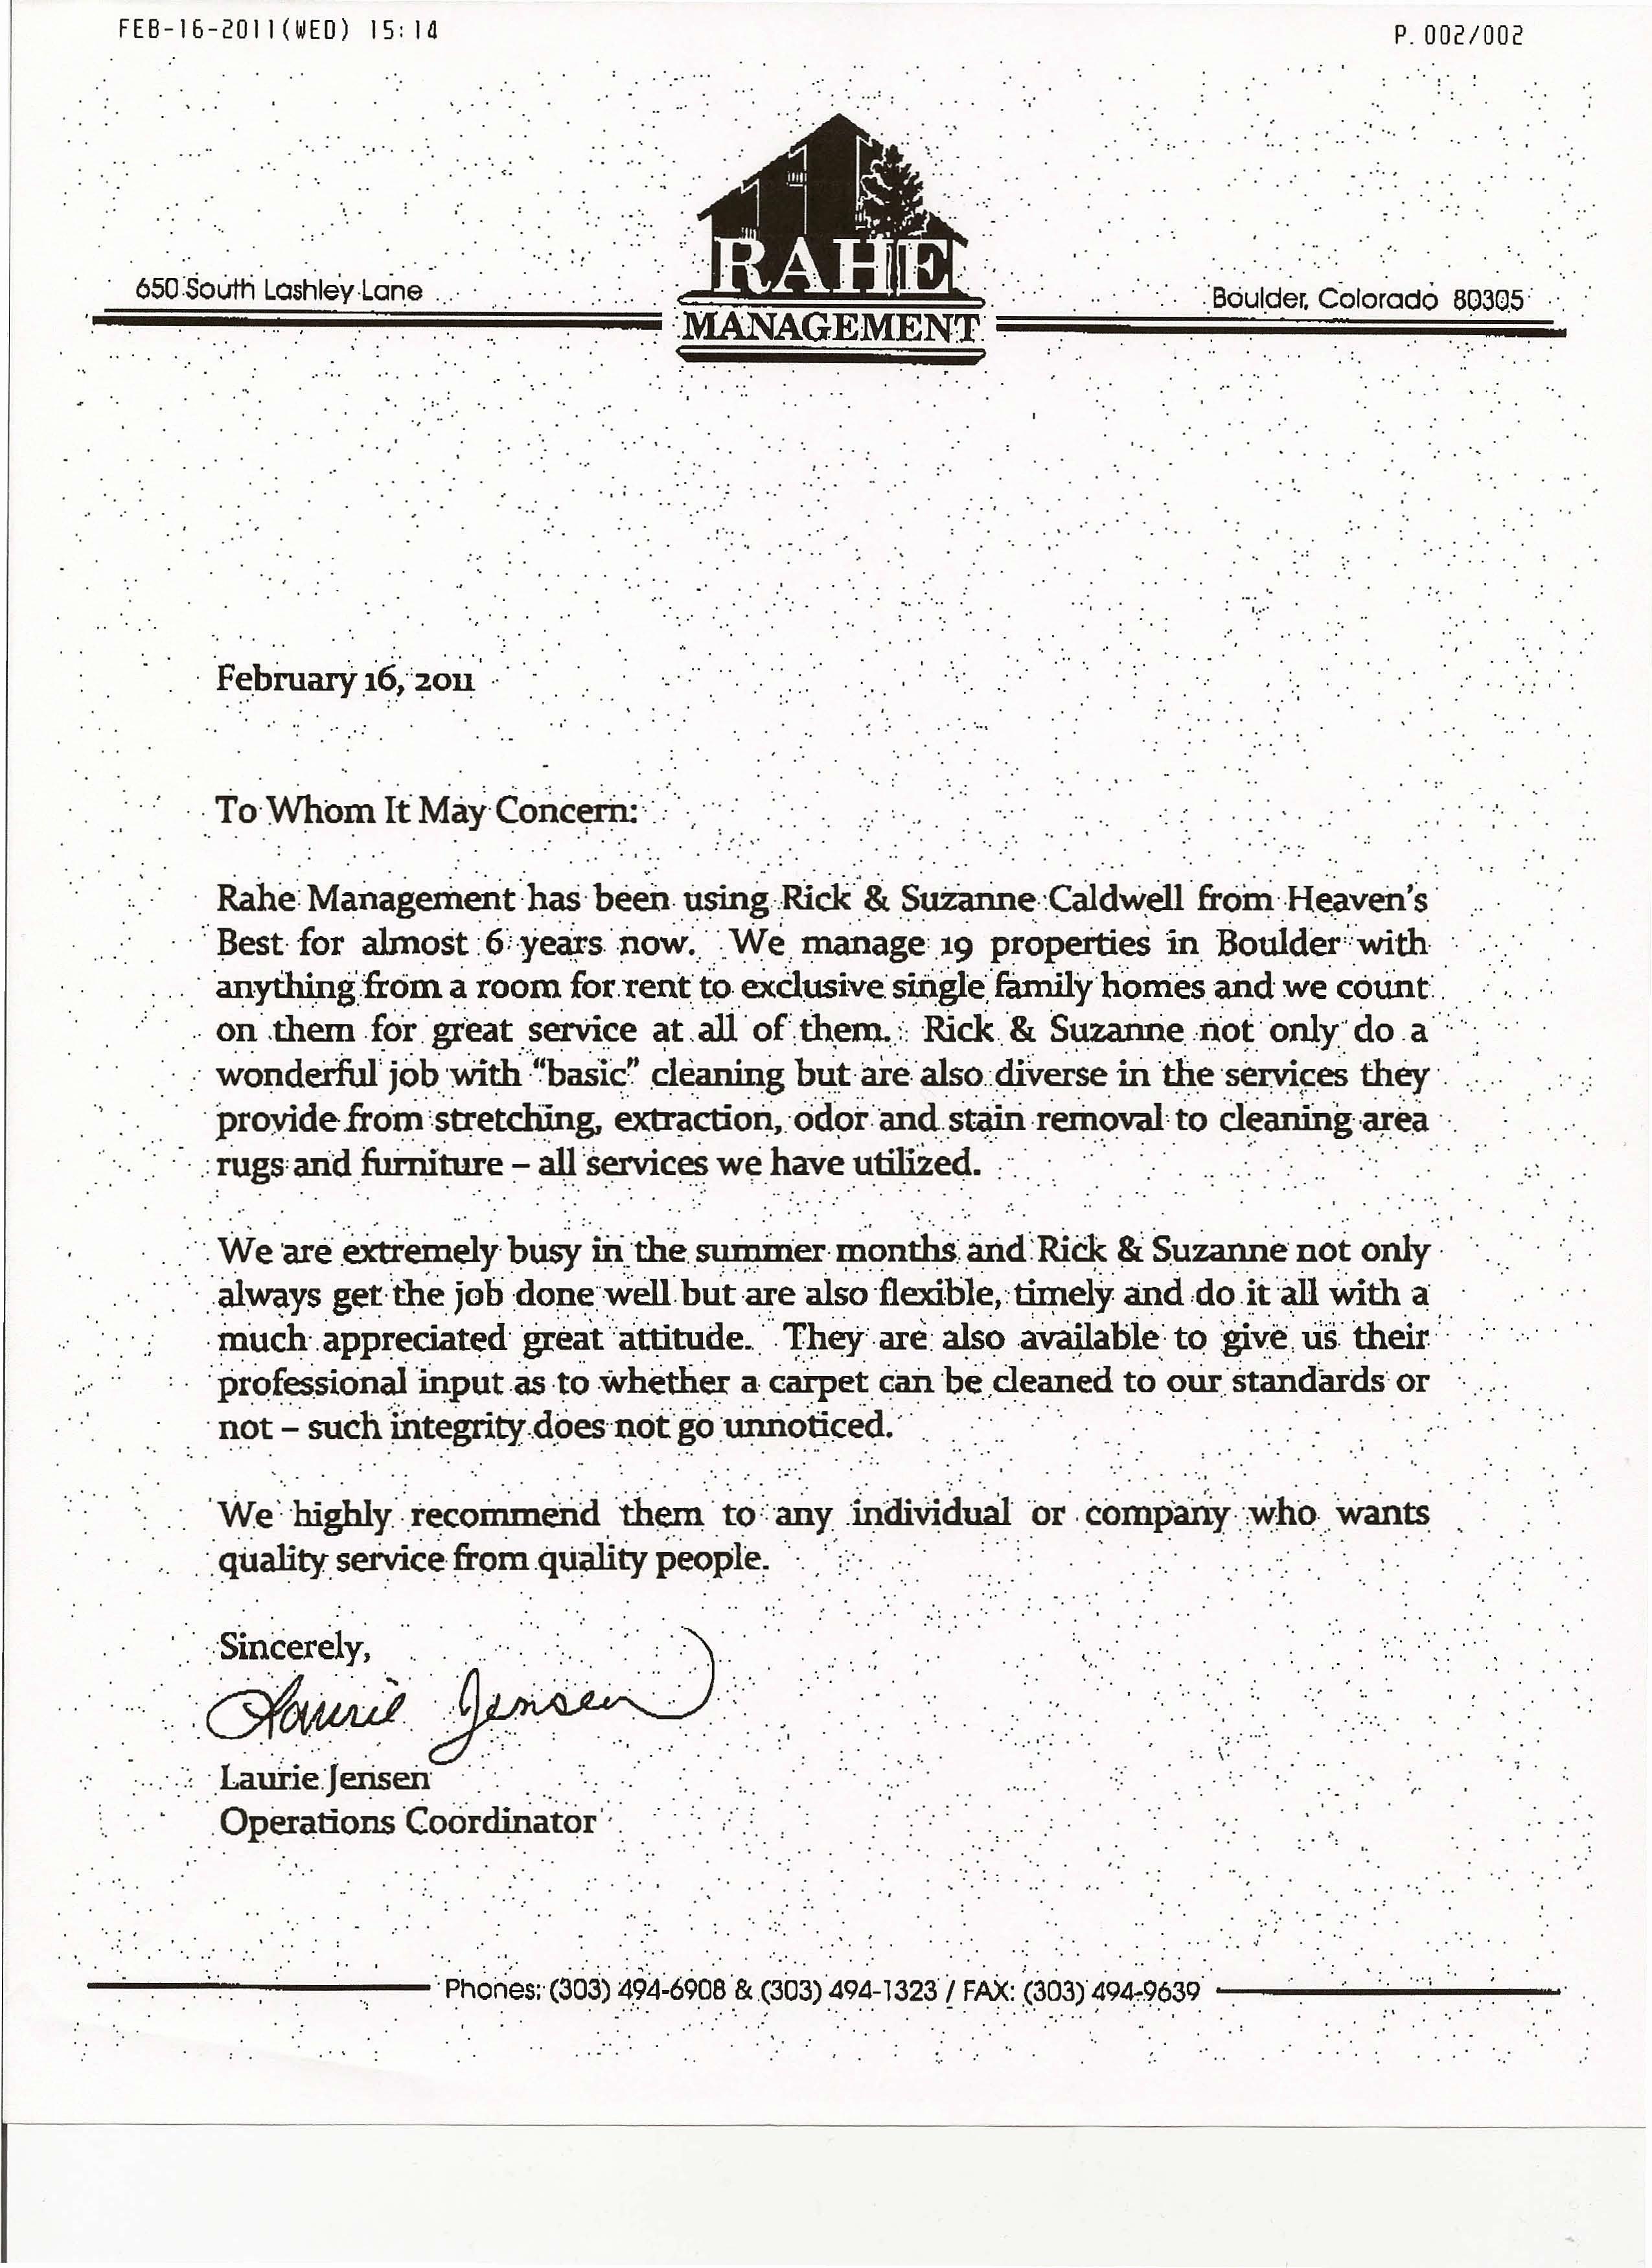 Customer Service Recommendation Letter Unique Heaven S Best Carpet Cleaning